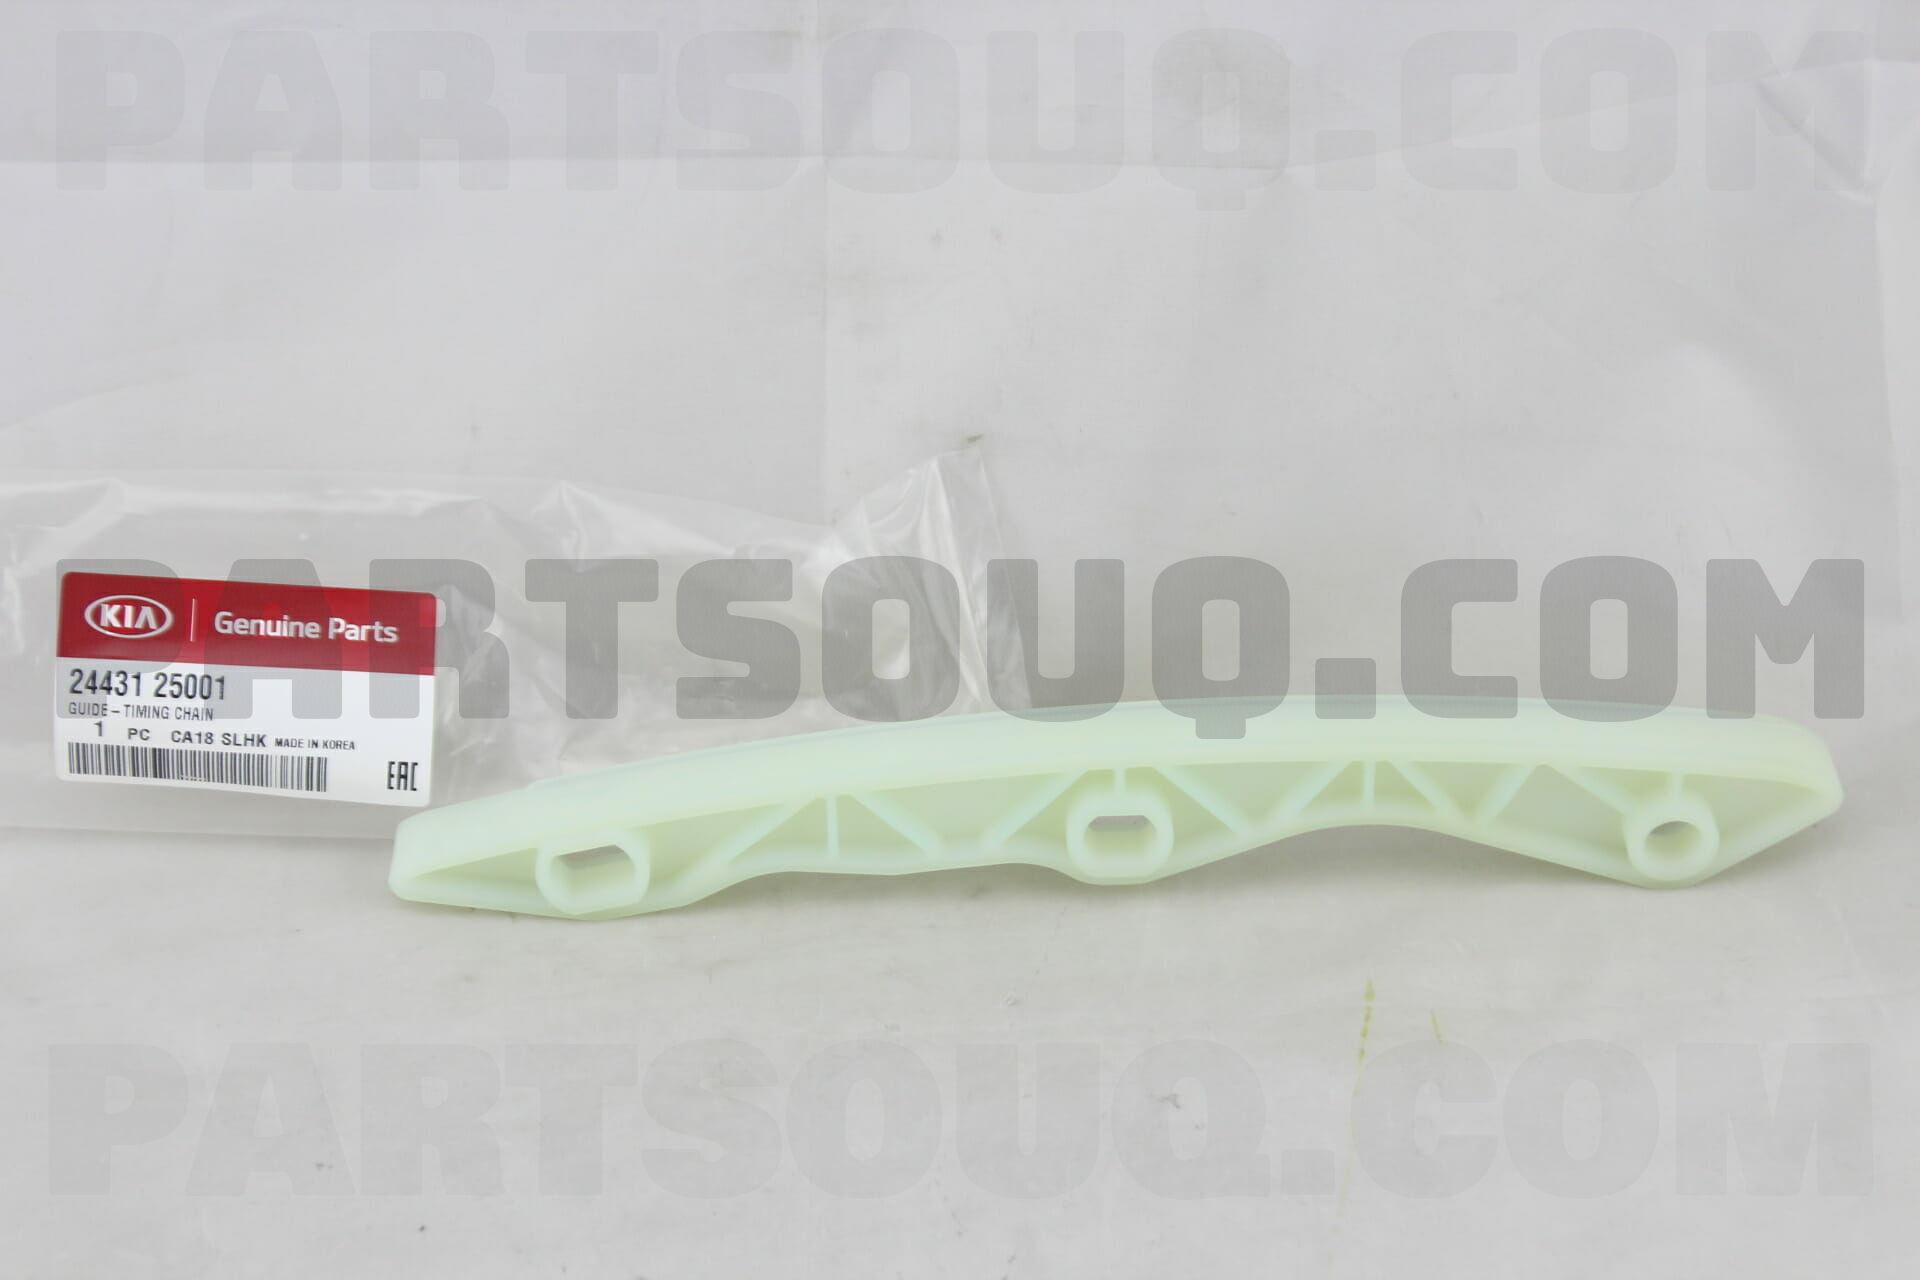 Genuine Hyundai 24431-25001 Timing Chain Guide